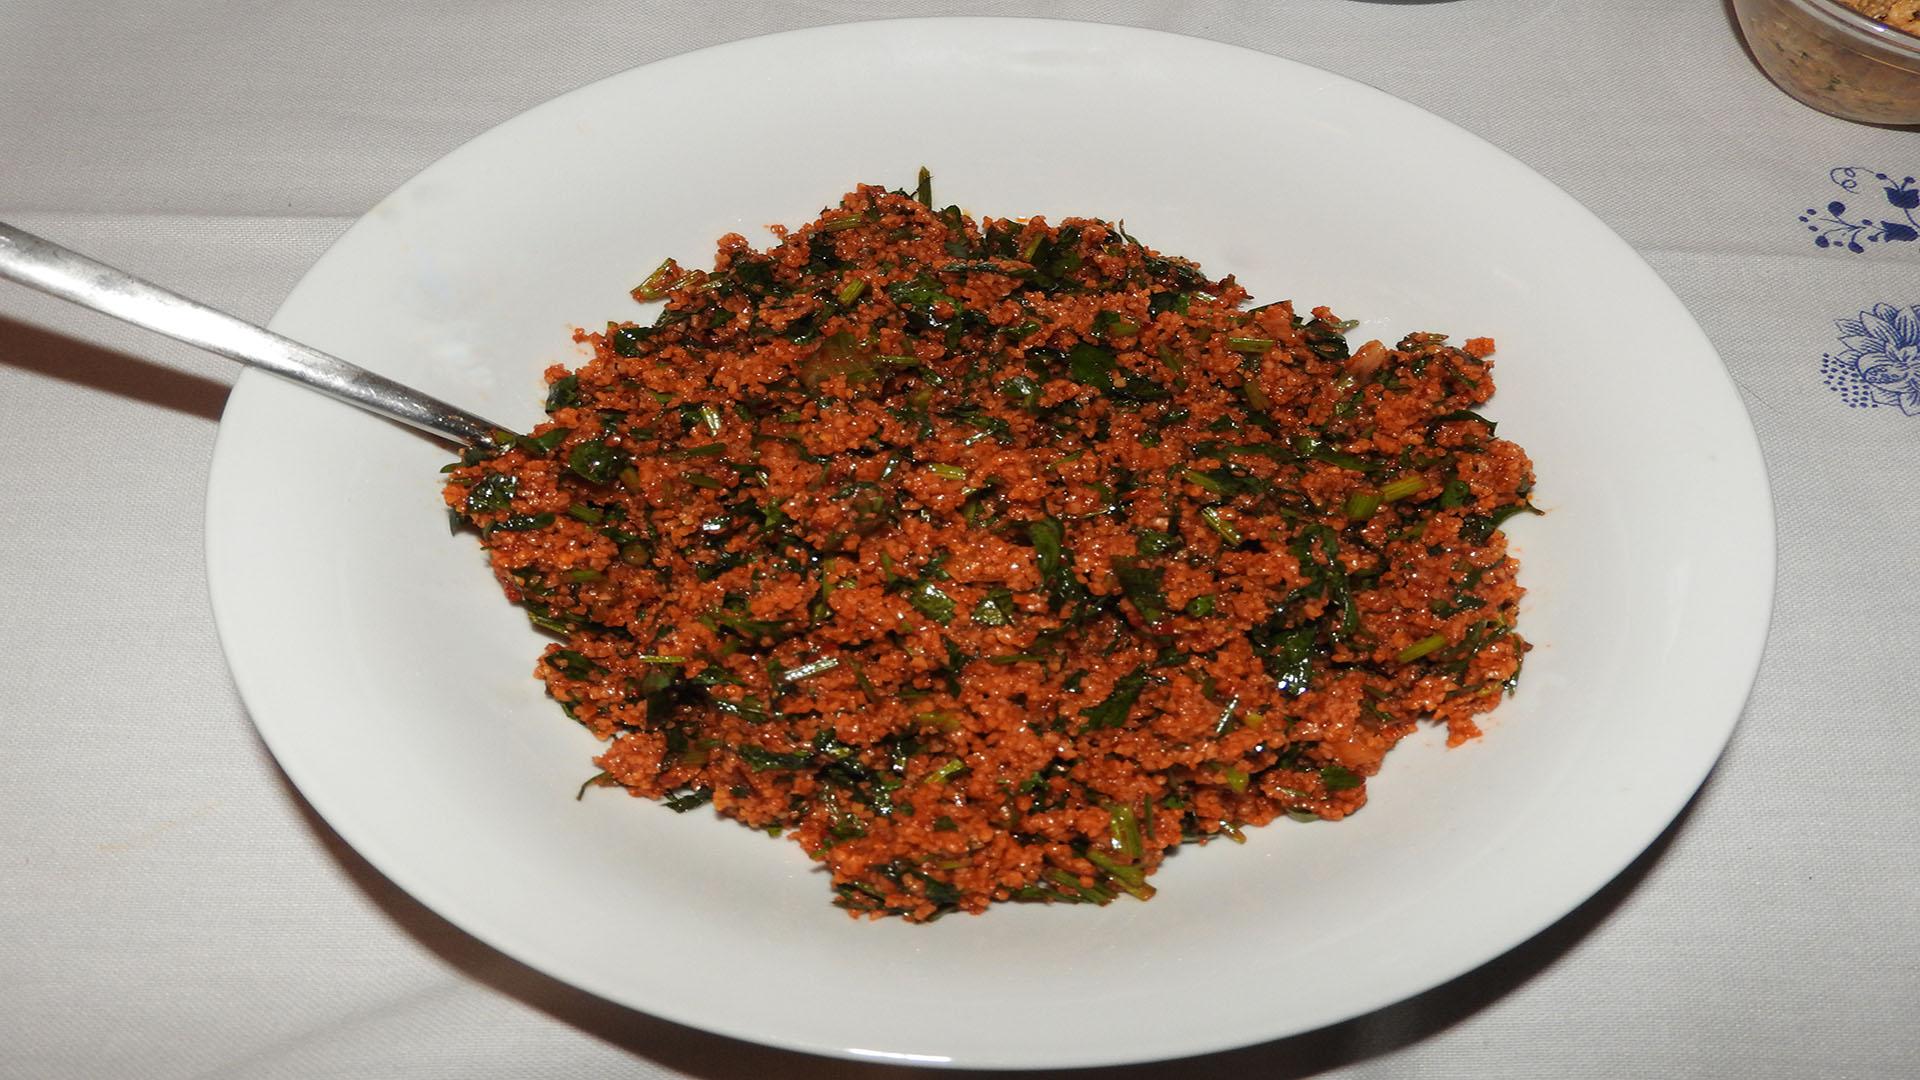 Couscous-Salat mit Petersilie auf Kochen-verstehen.de